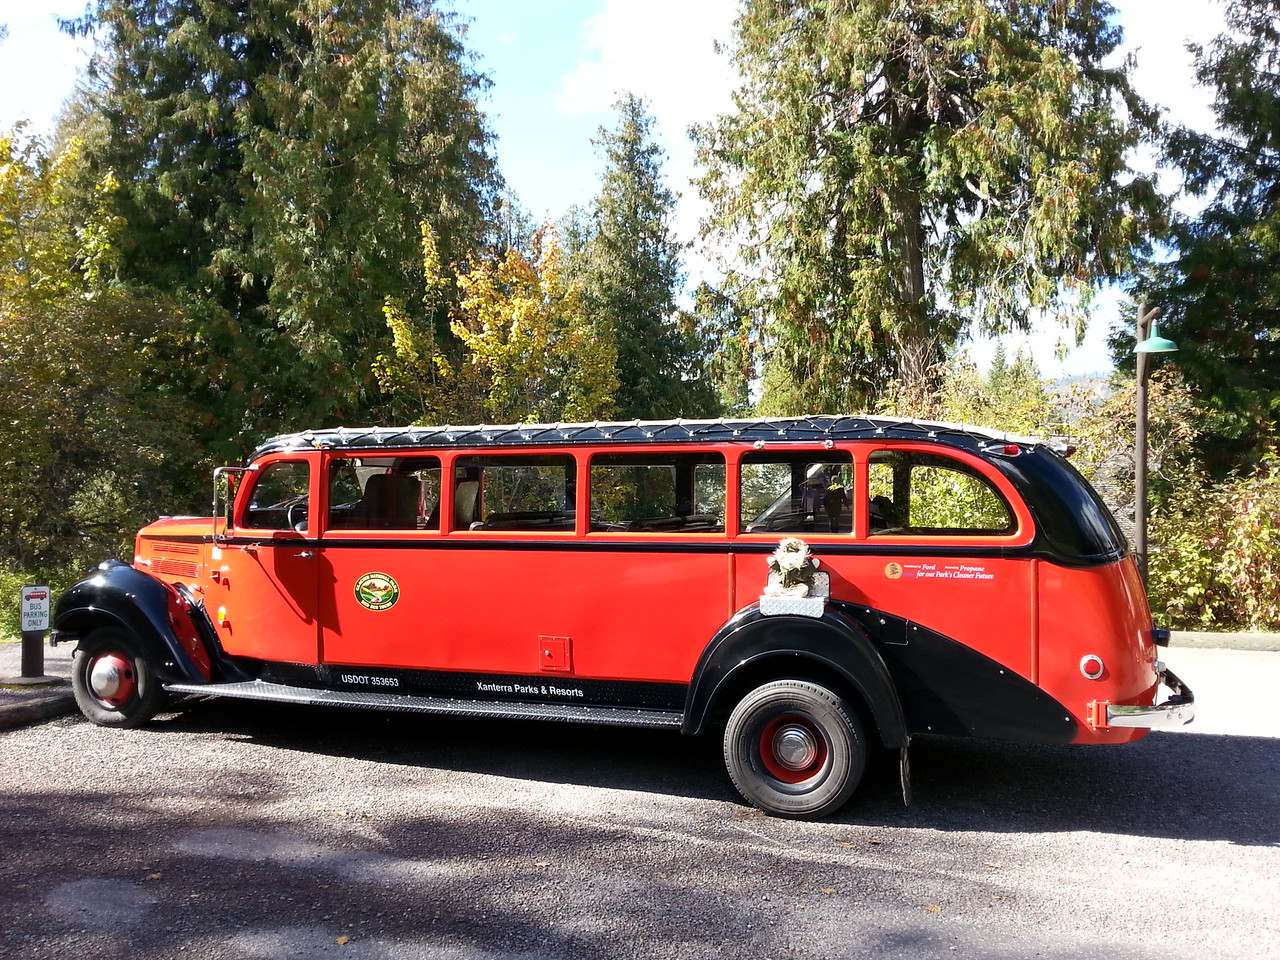 Red ' Jammer' tour bus Glacier National Park